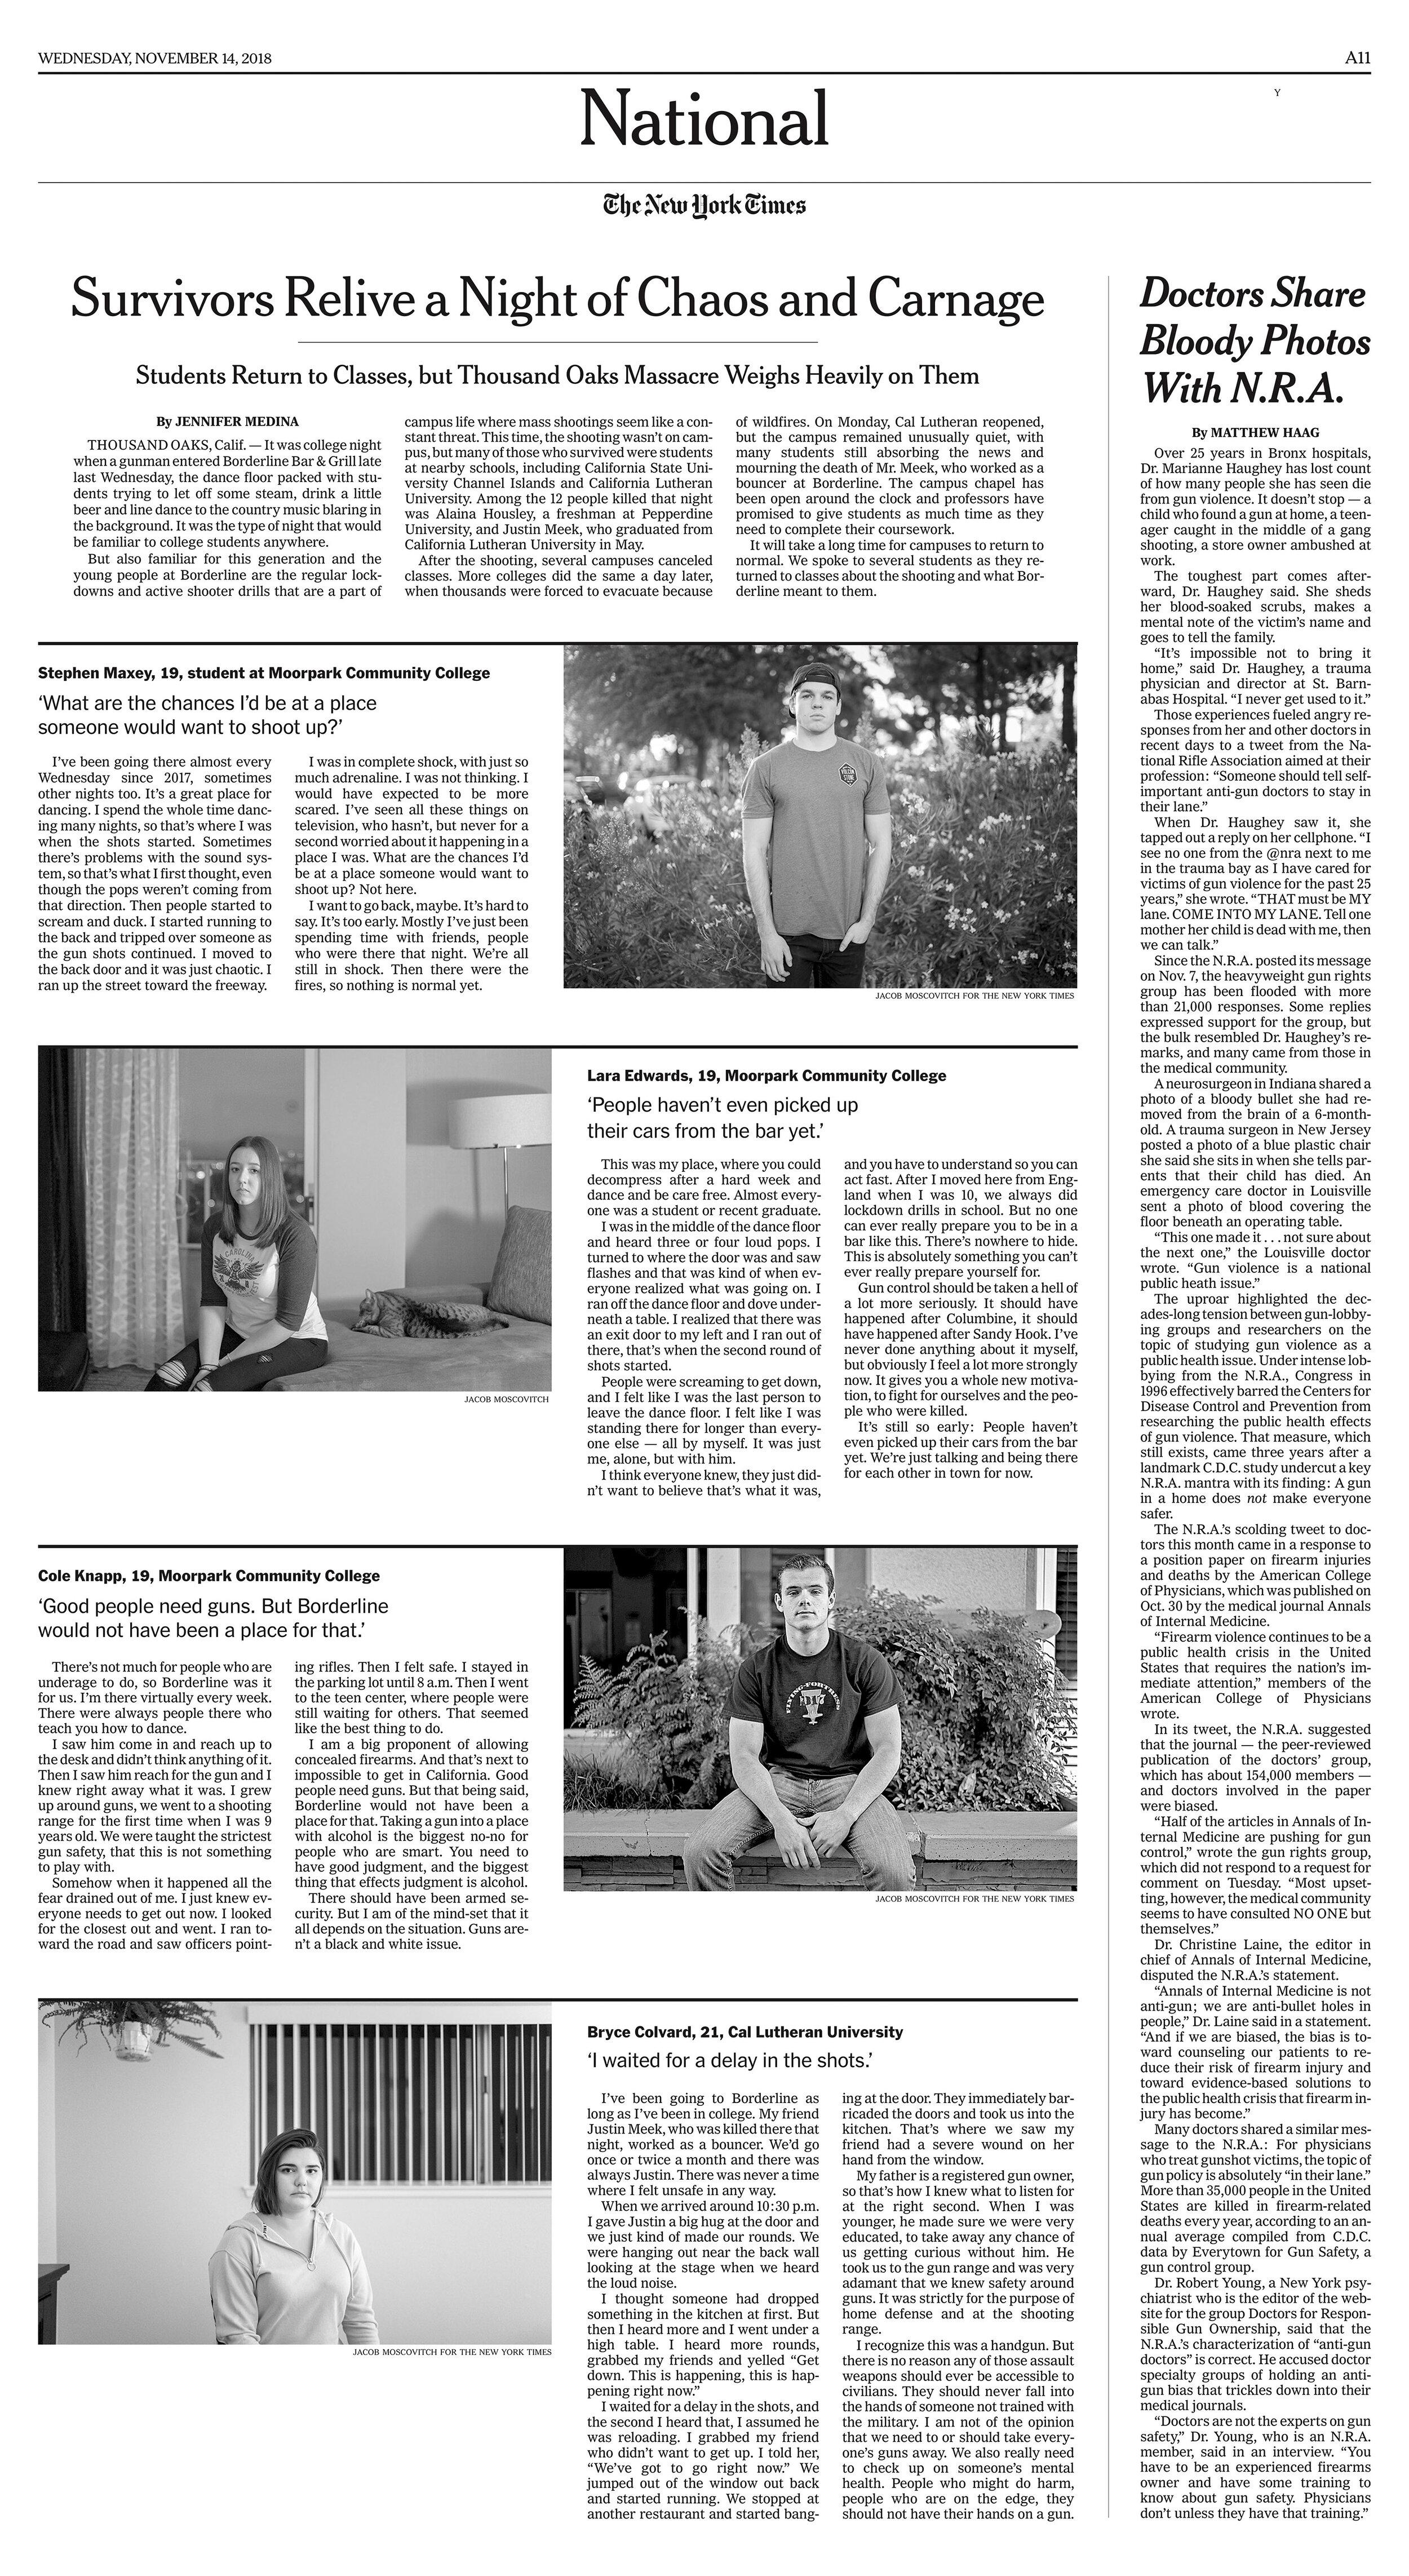 VIEW NEW YORK TIMES ONLINE PRESENTATION